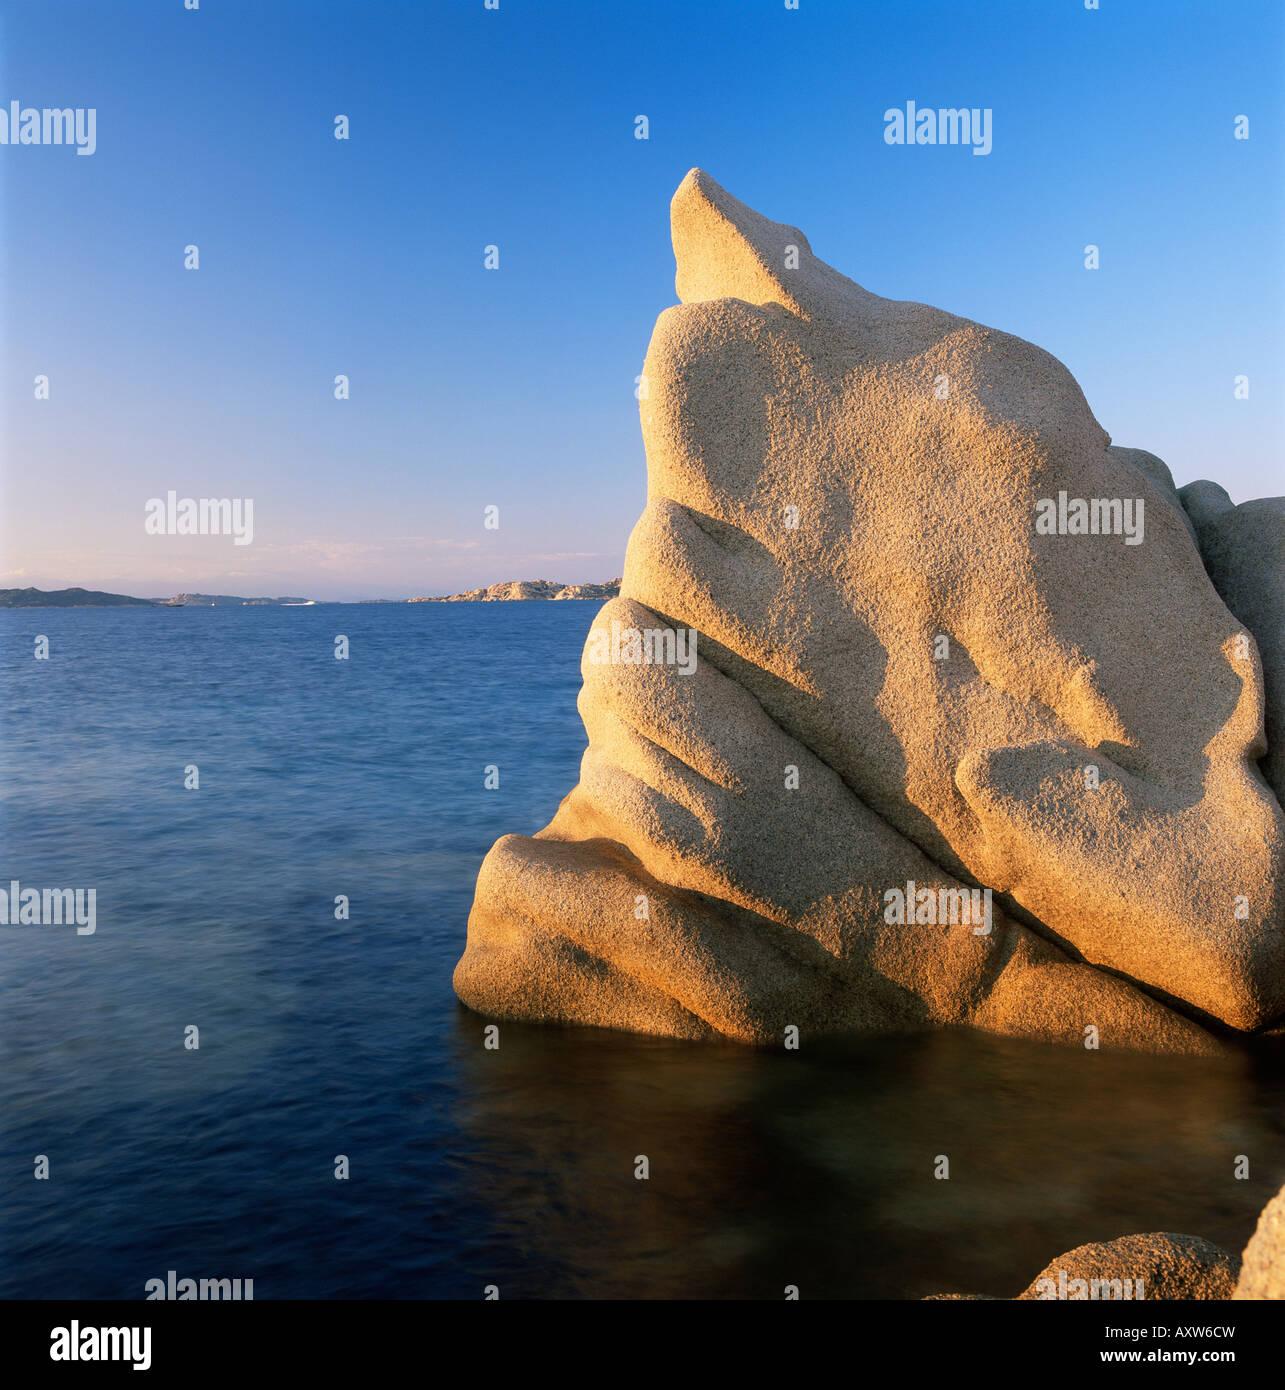 Wind eroded granite rock, Costa Smeralda, Sardinia, Italy, Mediterranean, Europe - Stock Image